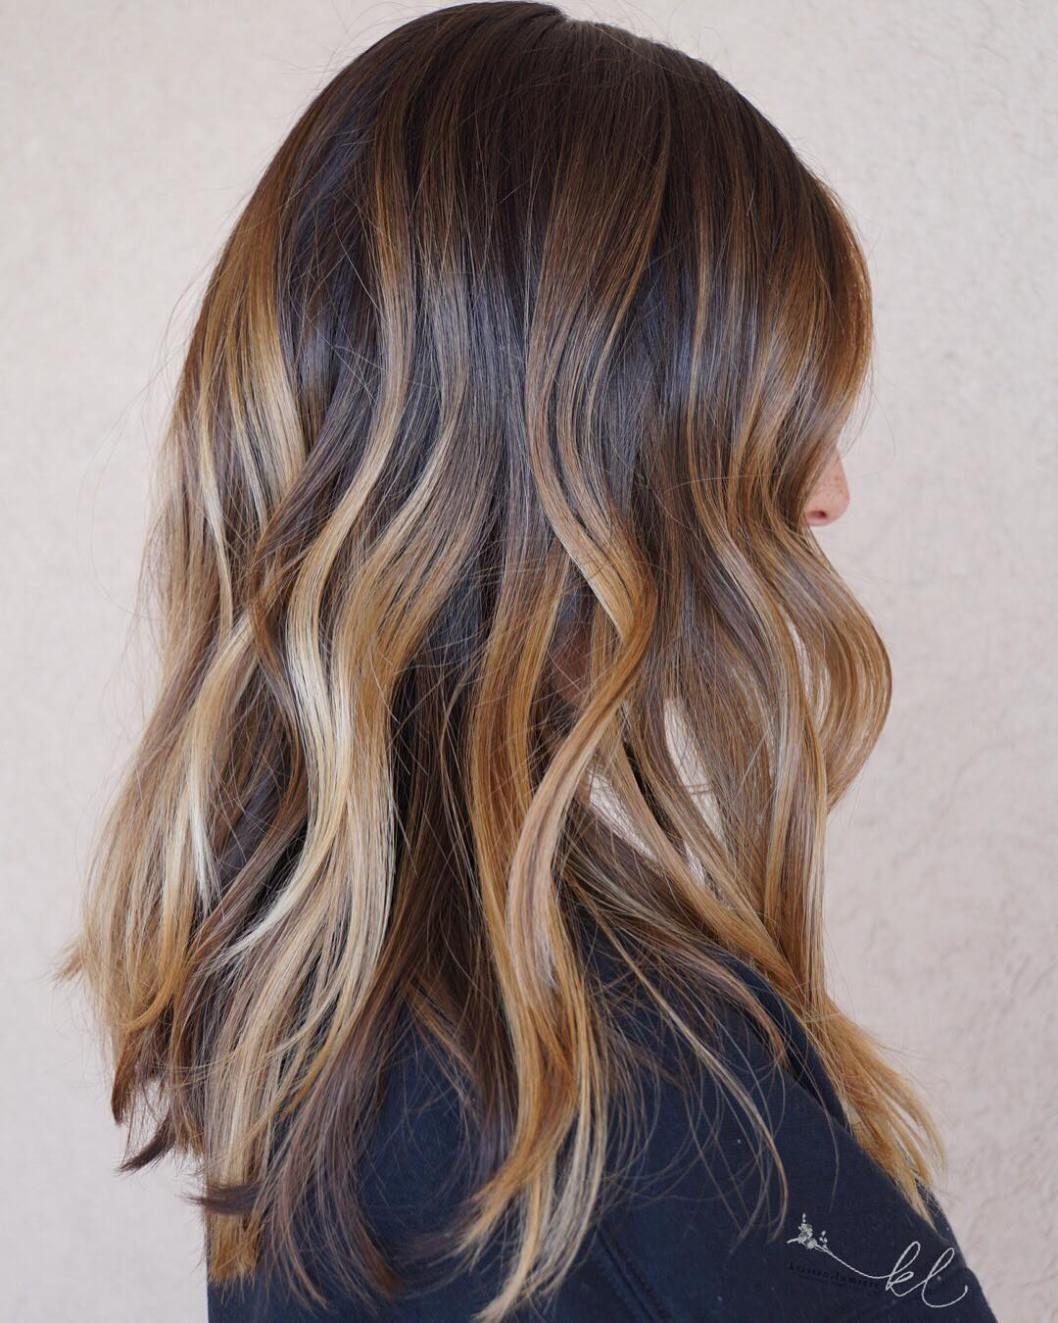 Dimensional Caramel Balayage Hair Cheveux Bruns Meches Blondes Teinture Cheveux Cheveux